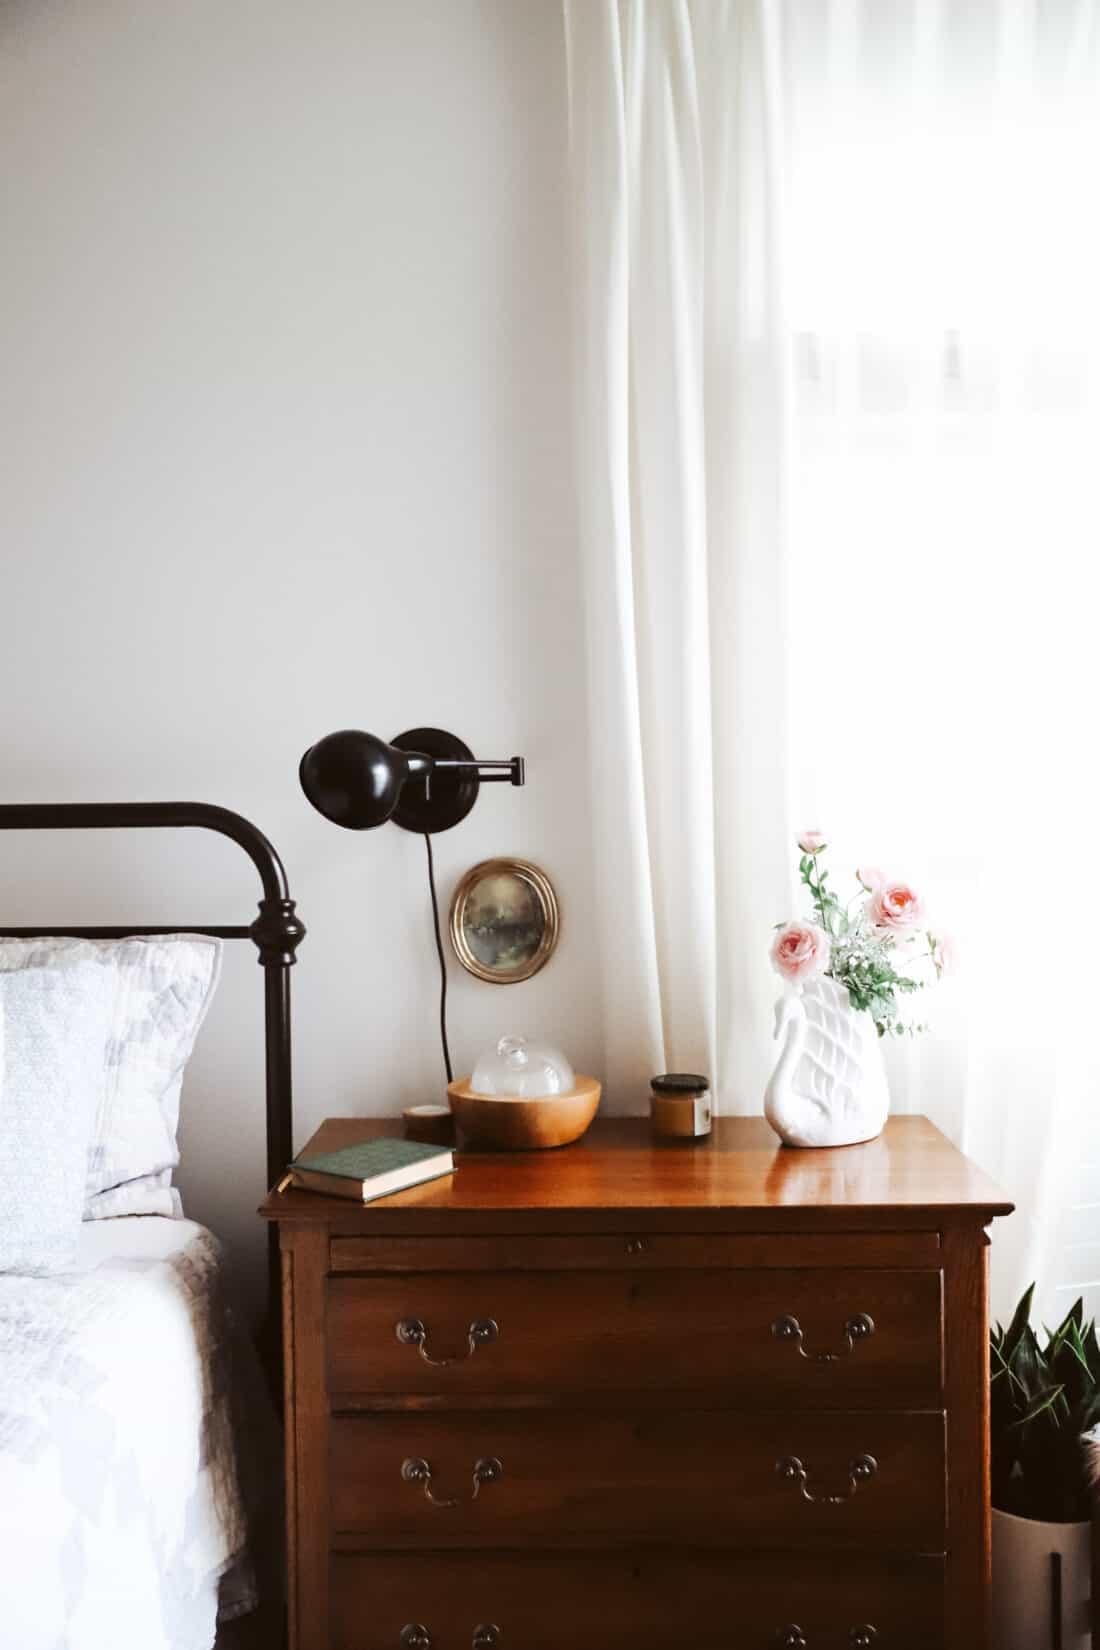 aria diffuser in bedroom on nightstand